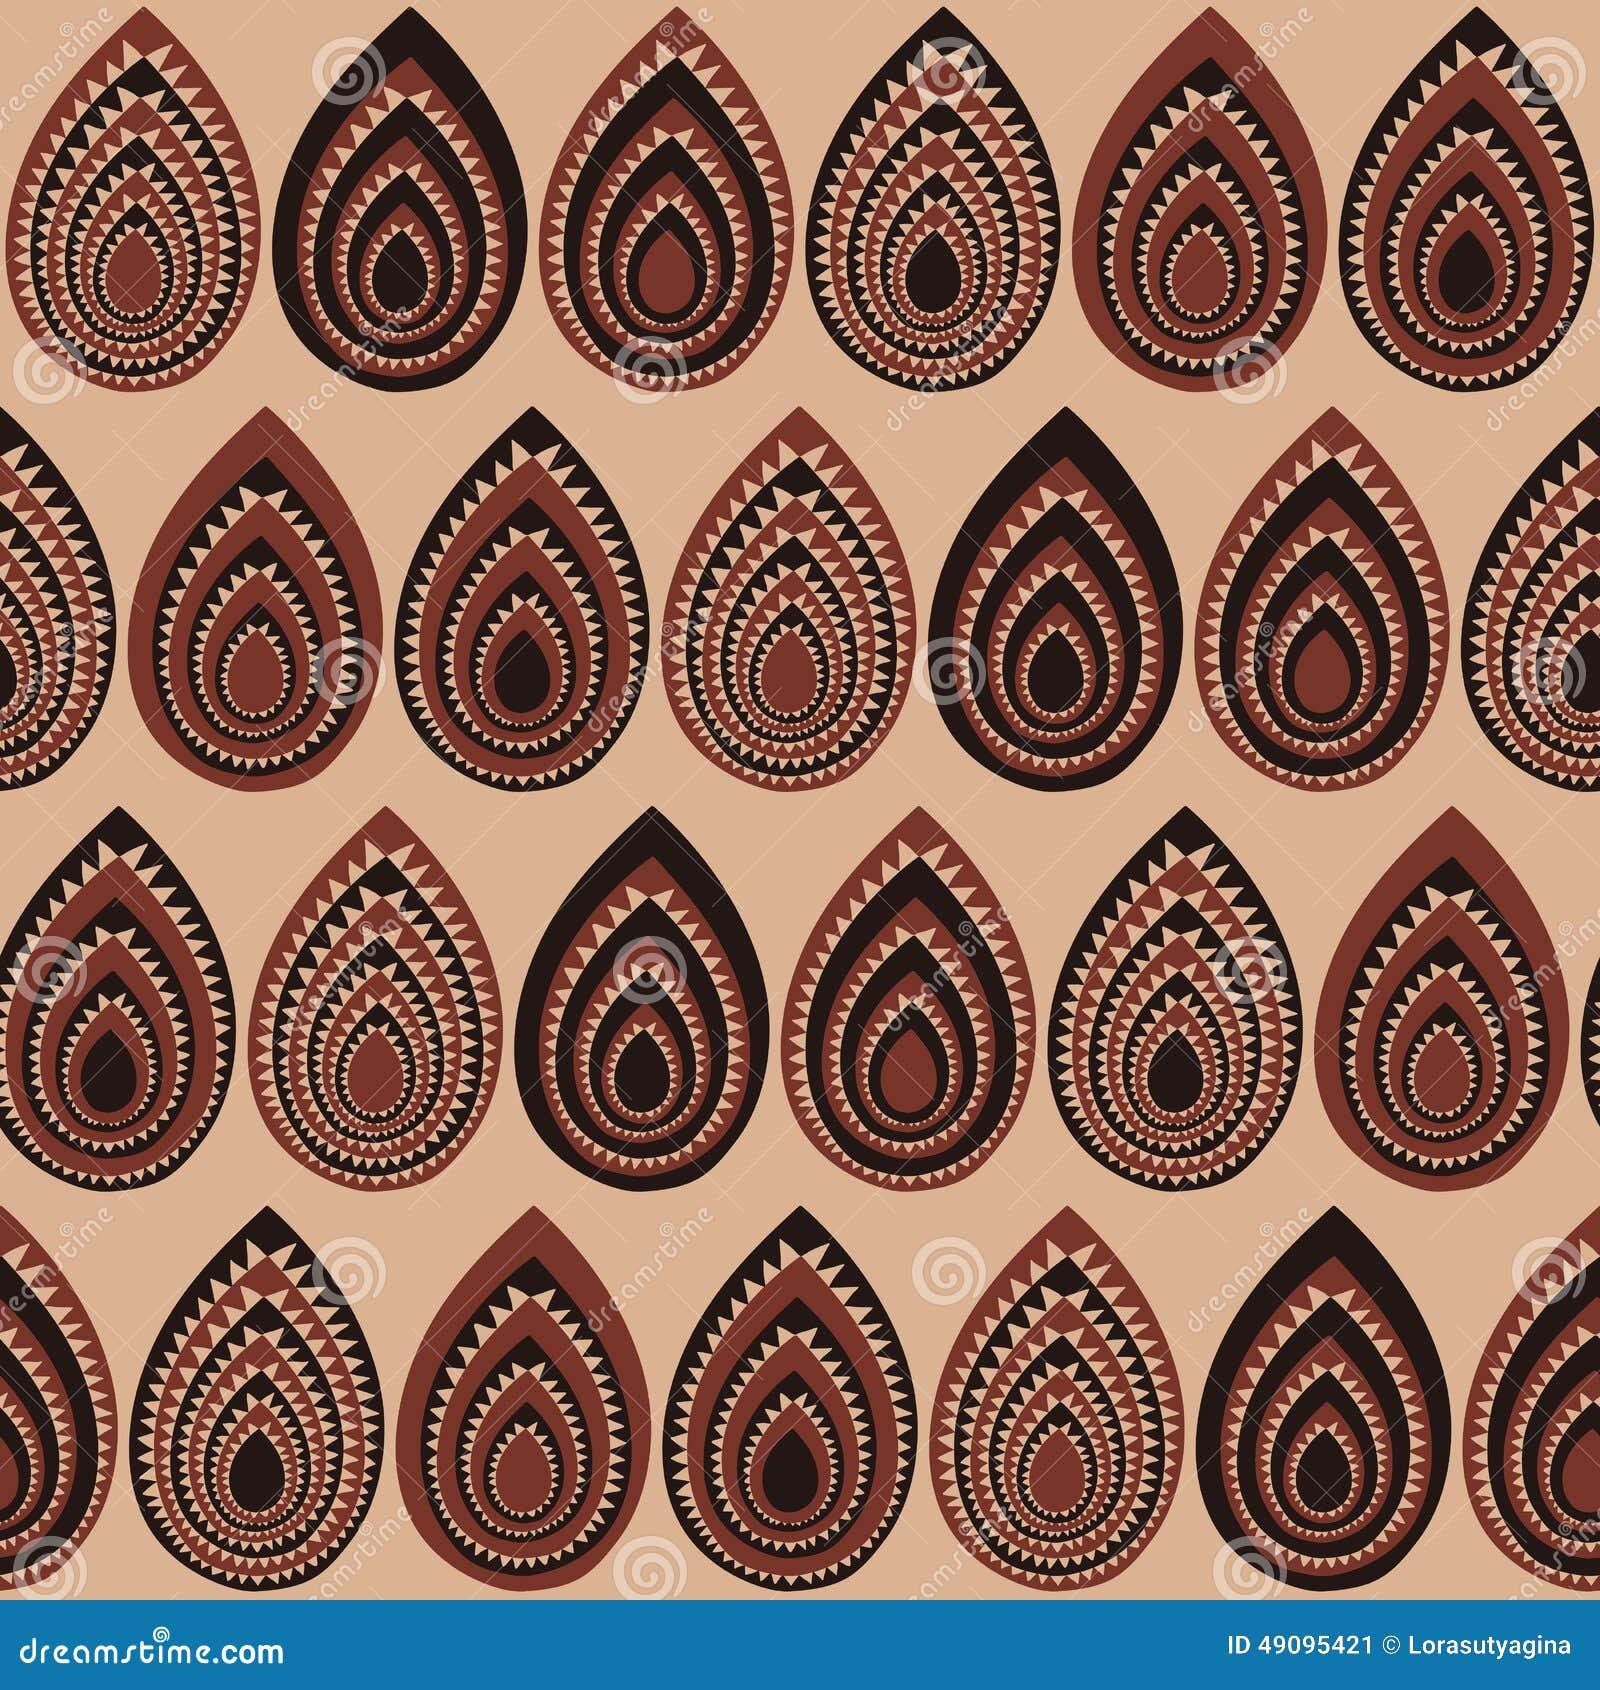 Abstract Traditioneel Afrikaans Ornament Naadloos vectorpatroon